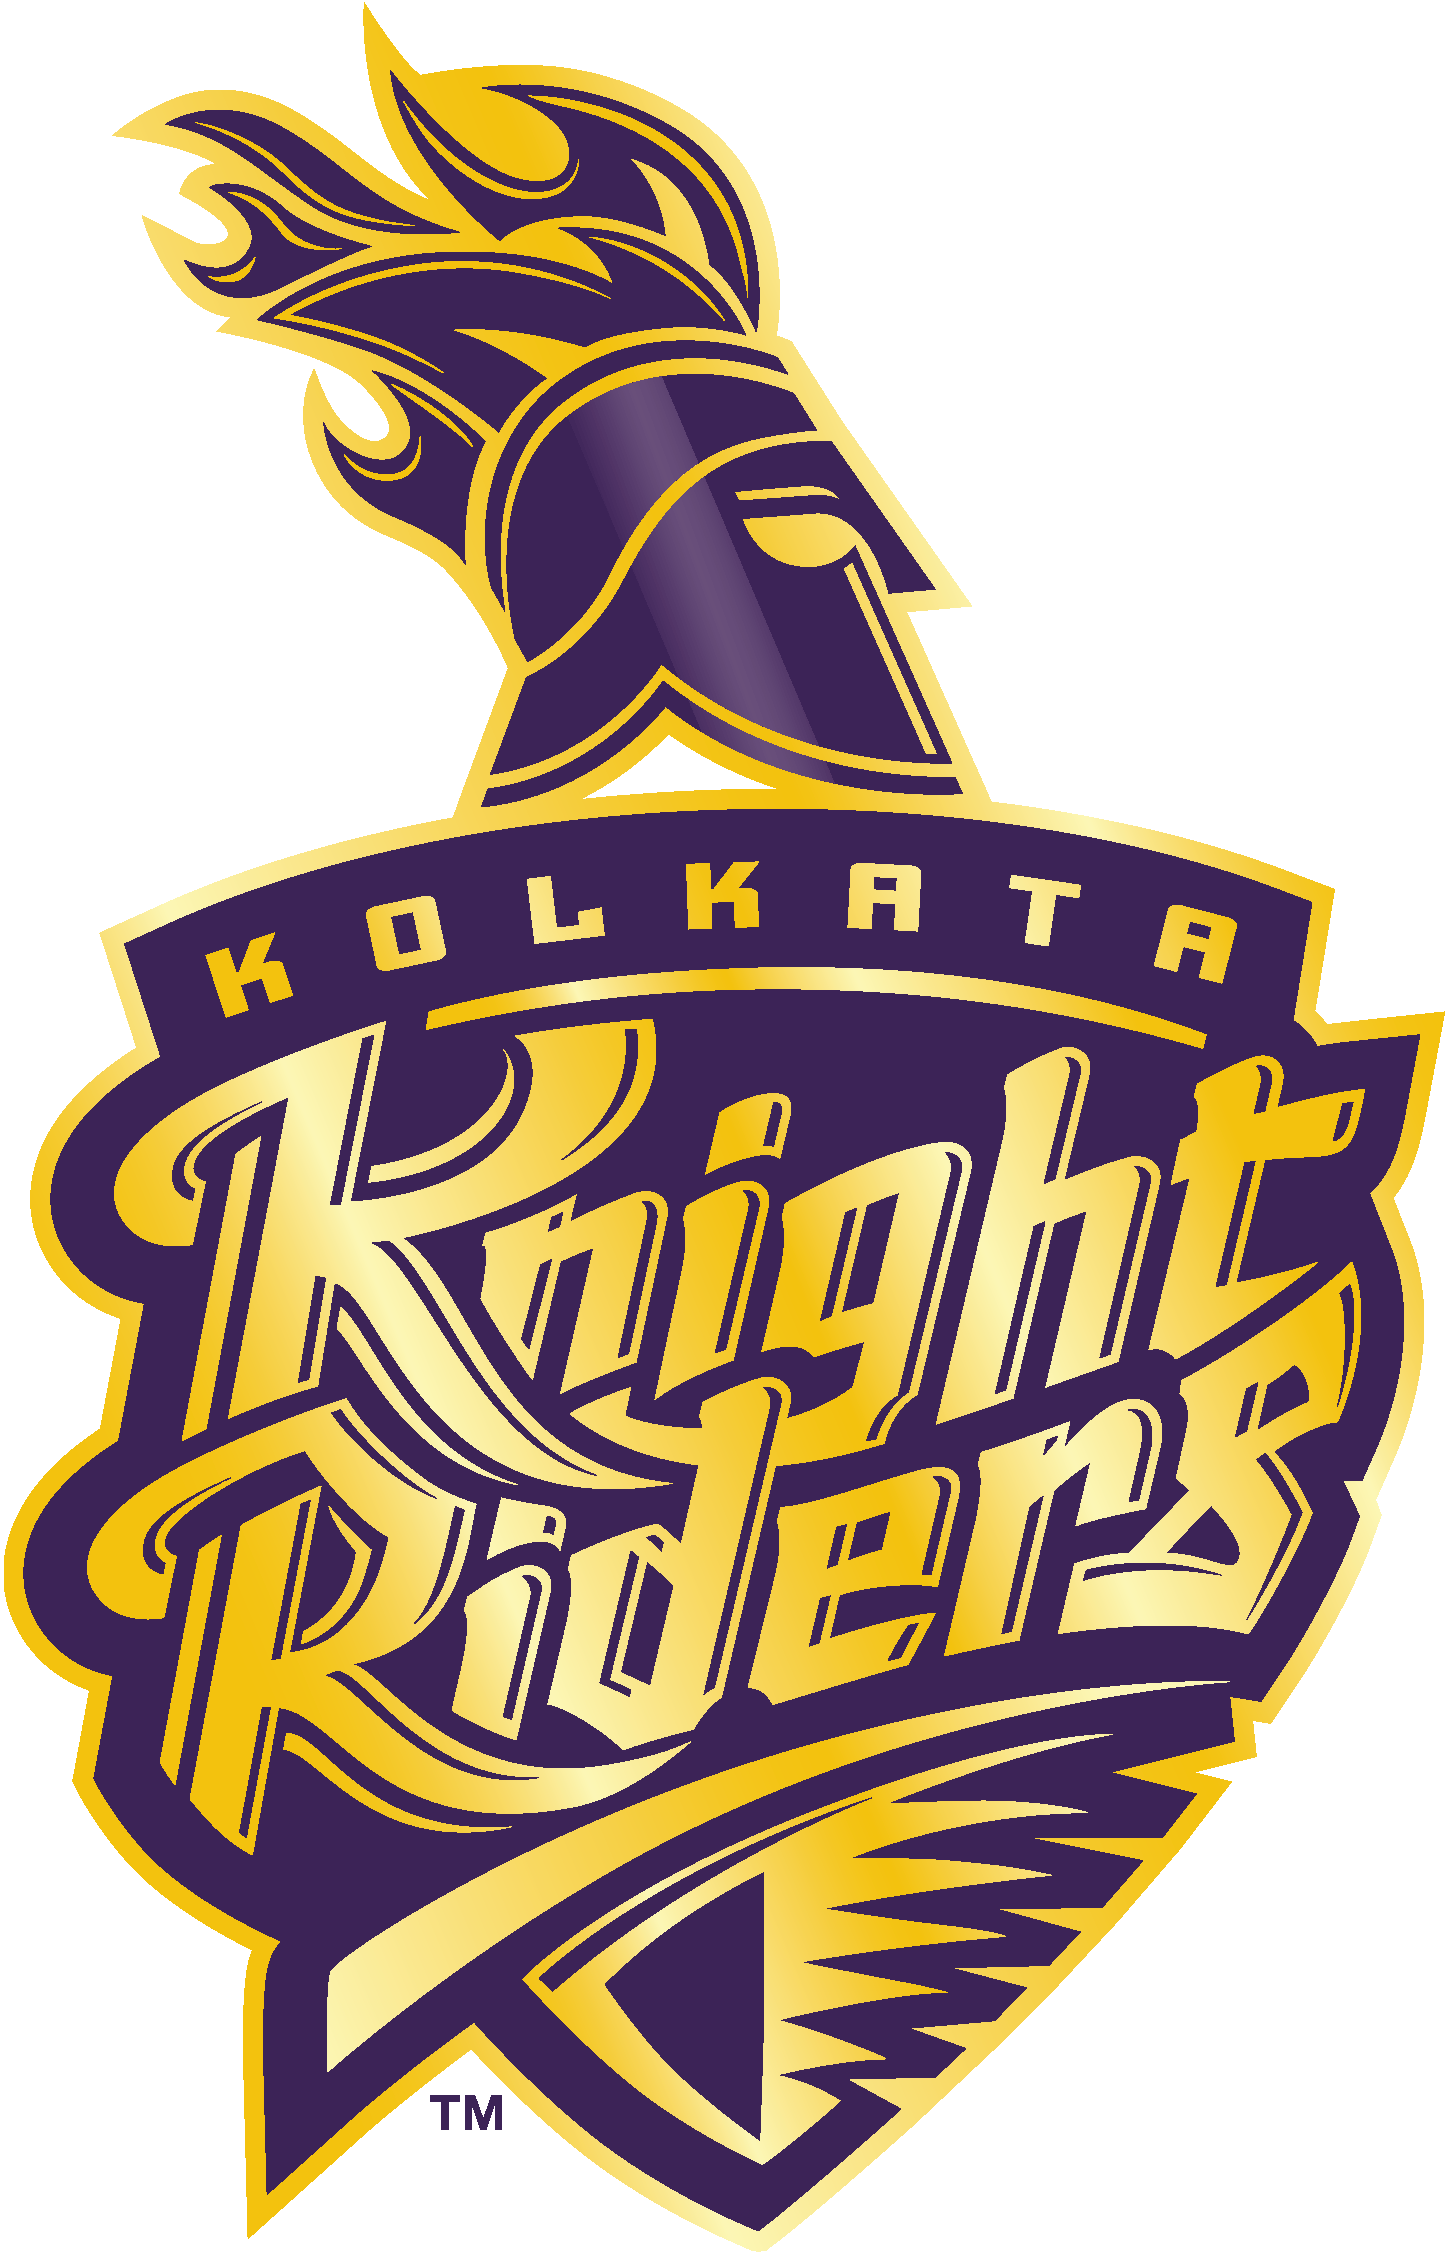 Kolkata Knight Riders Logo [kkr.in] png